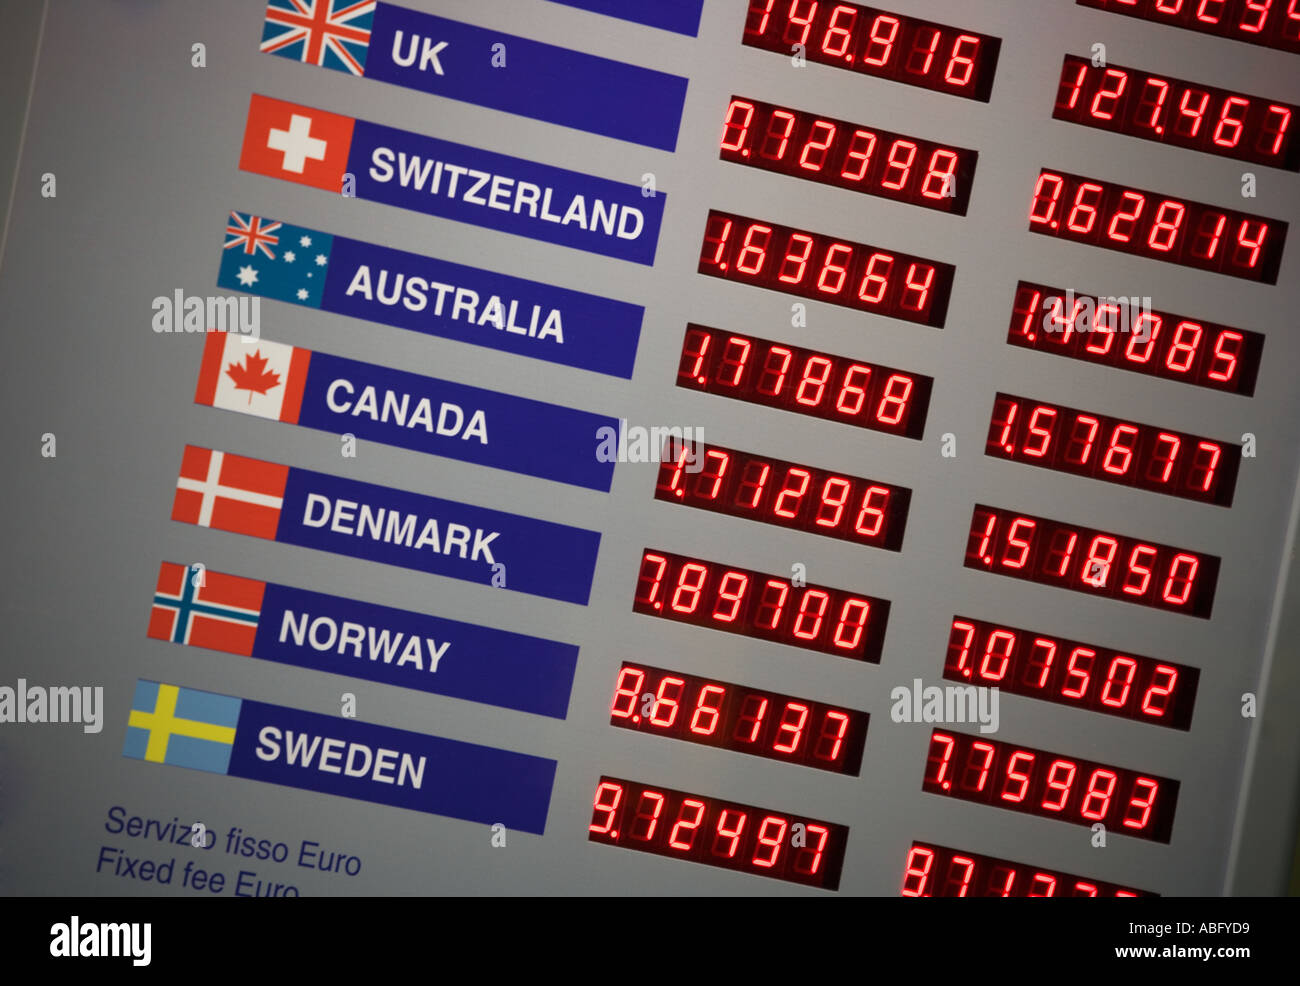 Pantalla electrónica de tasas de intercambio Foto de stock